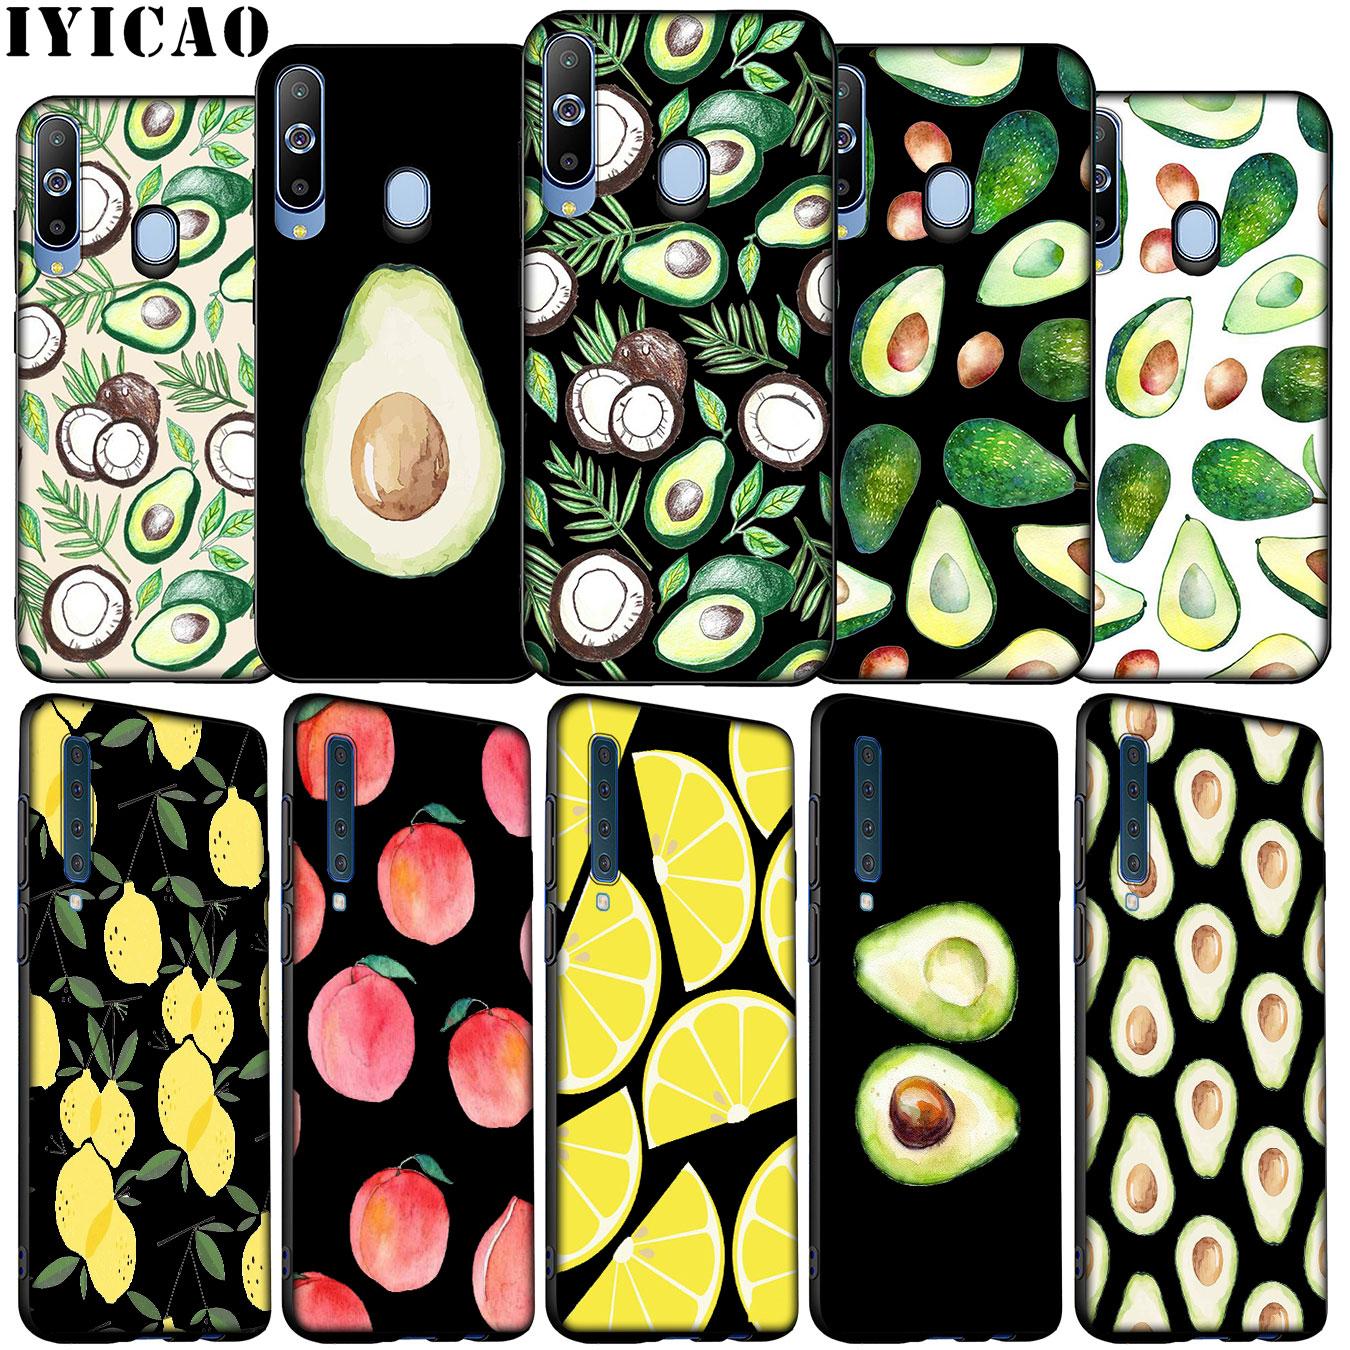 Aguacate frutas suave silicona caso para Samsung Galaxy A70 A50 A60 A40 A30 A20 A10 M10 M20 M30 M40 A20E cubierta